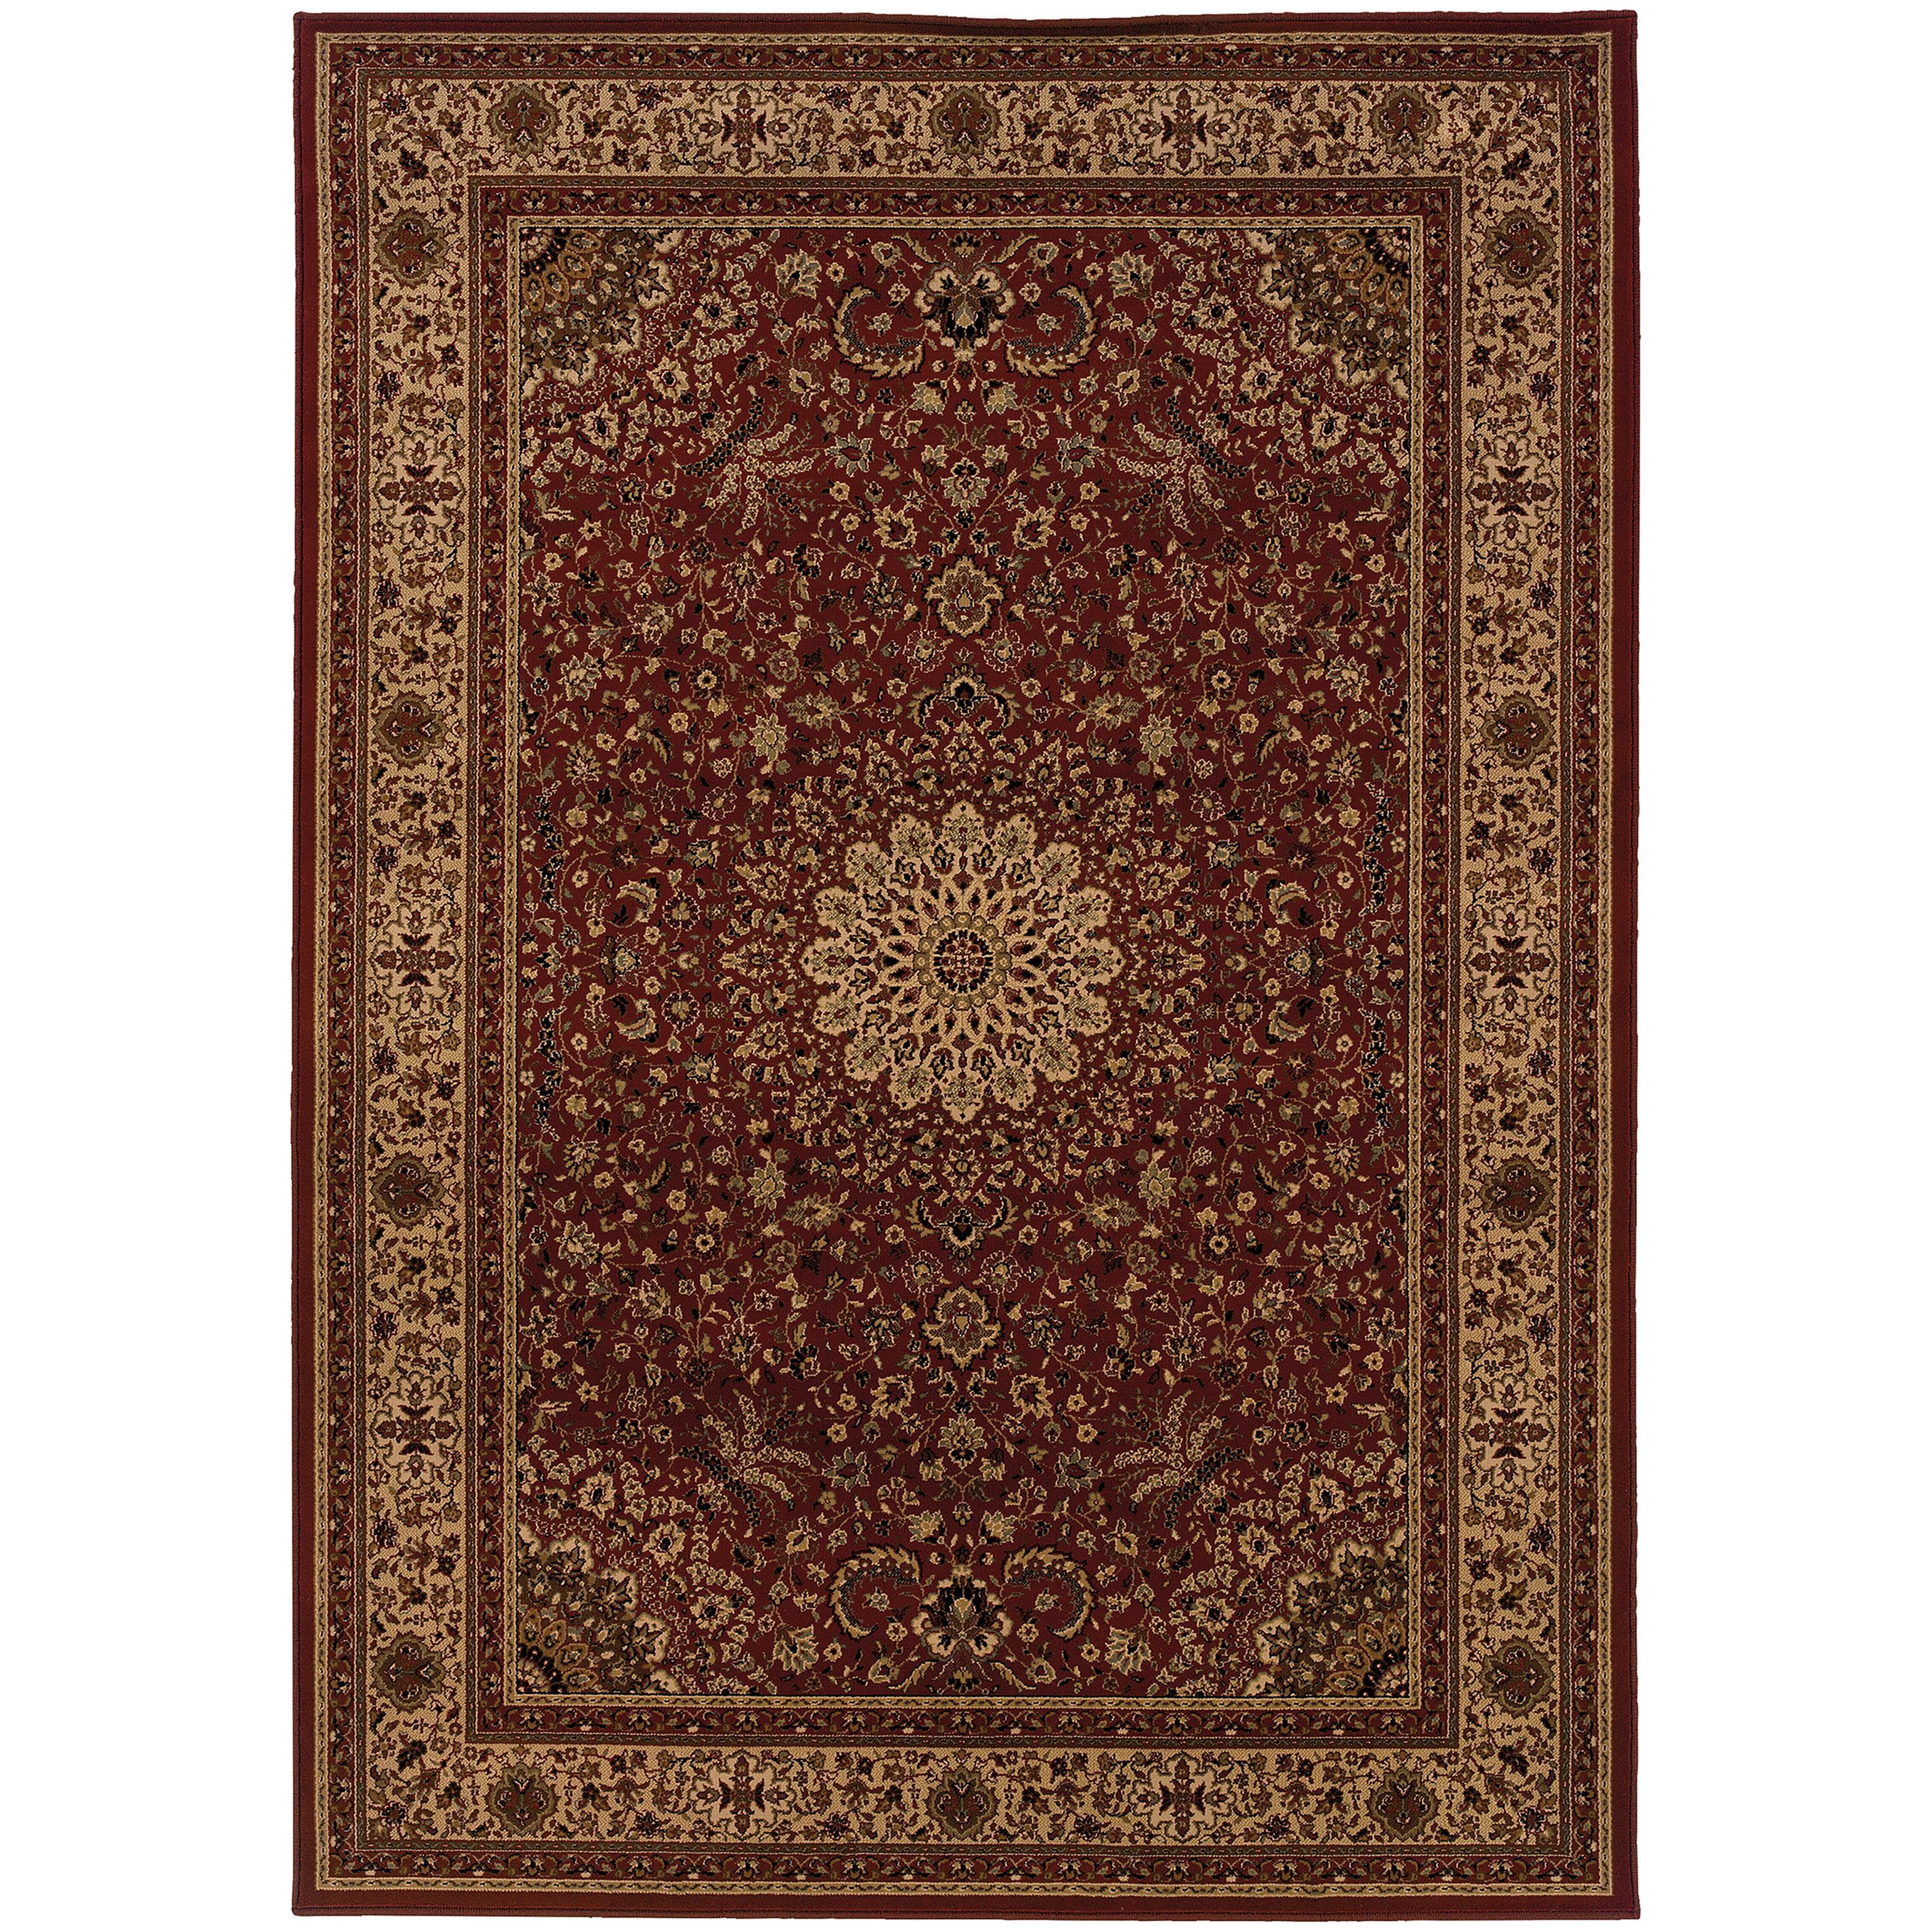 "Oriental Weavers Cambridge 9'10"" X 12'10"" Rug - Item Number: C195R2300390ST"